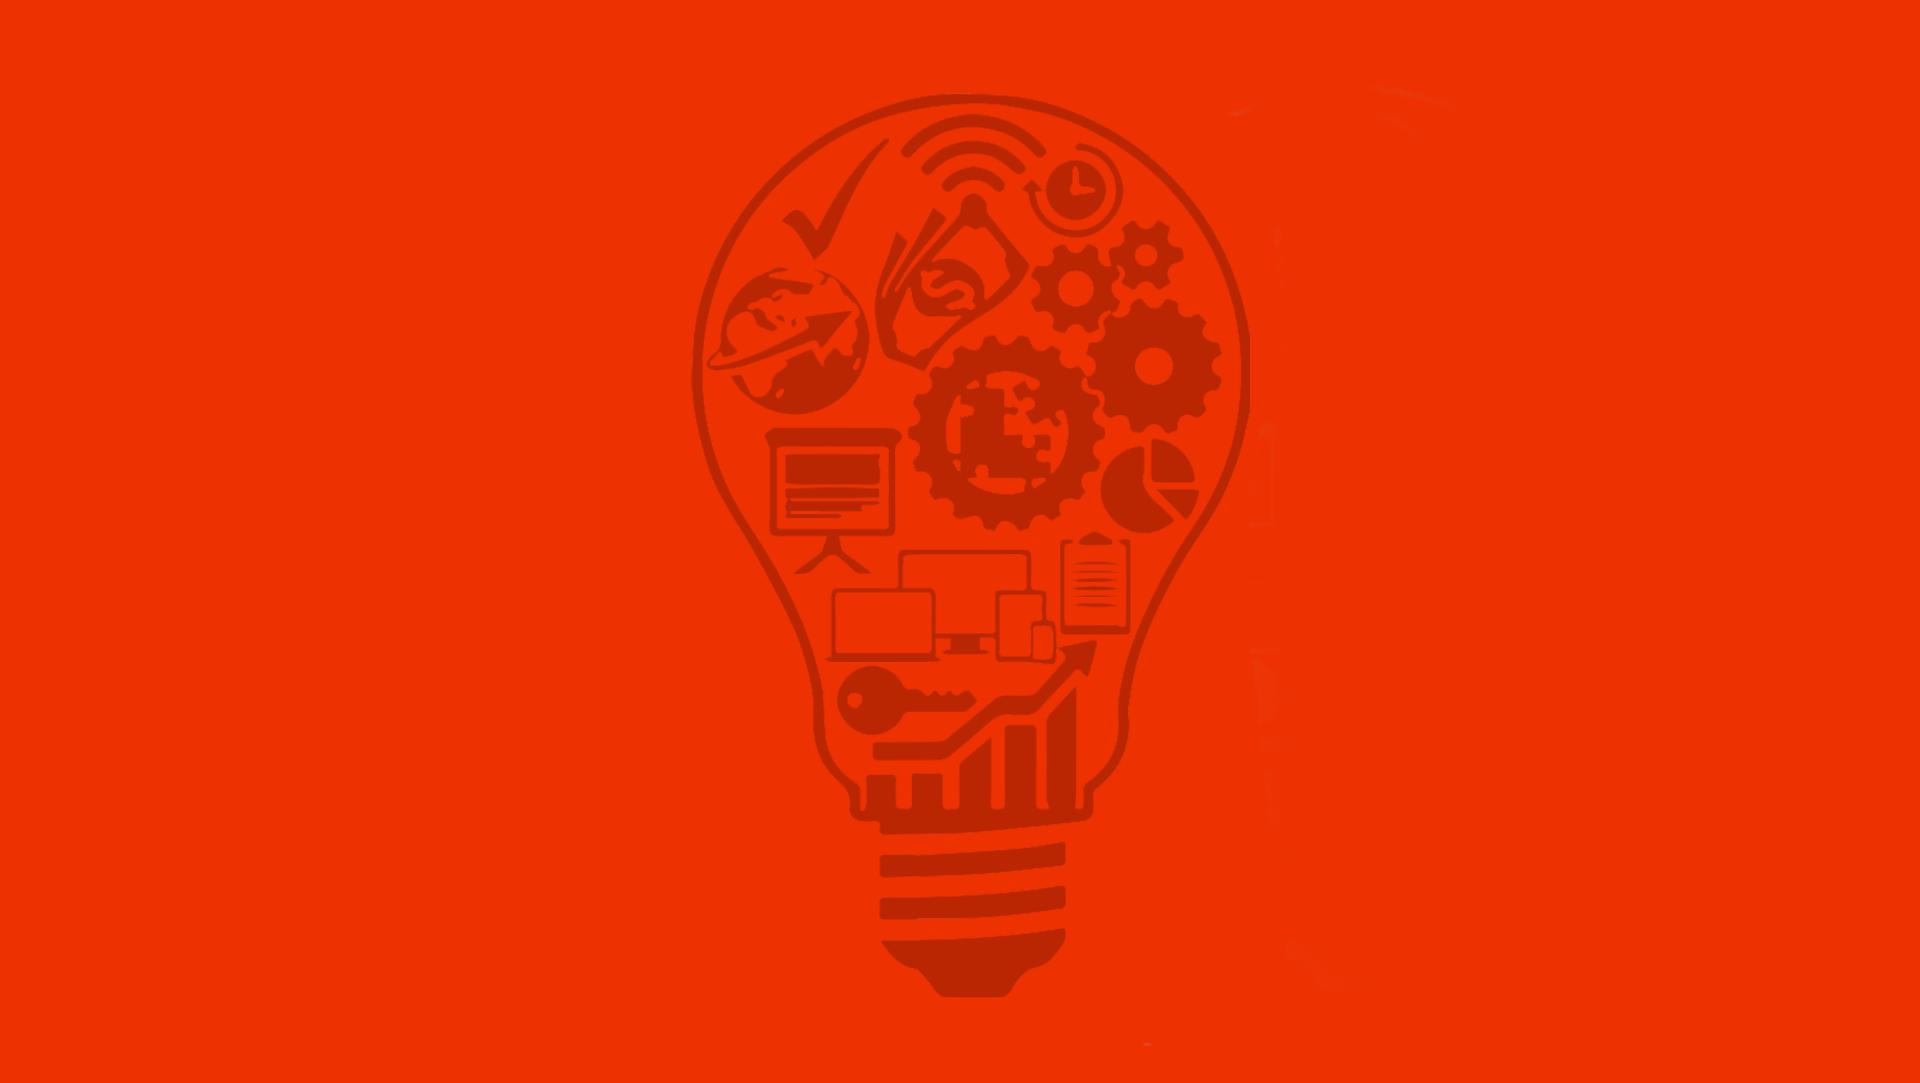 Strategic Marketing & Brand Development